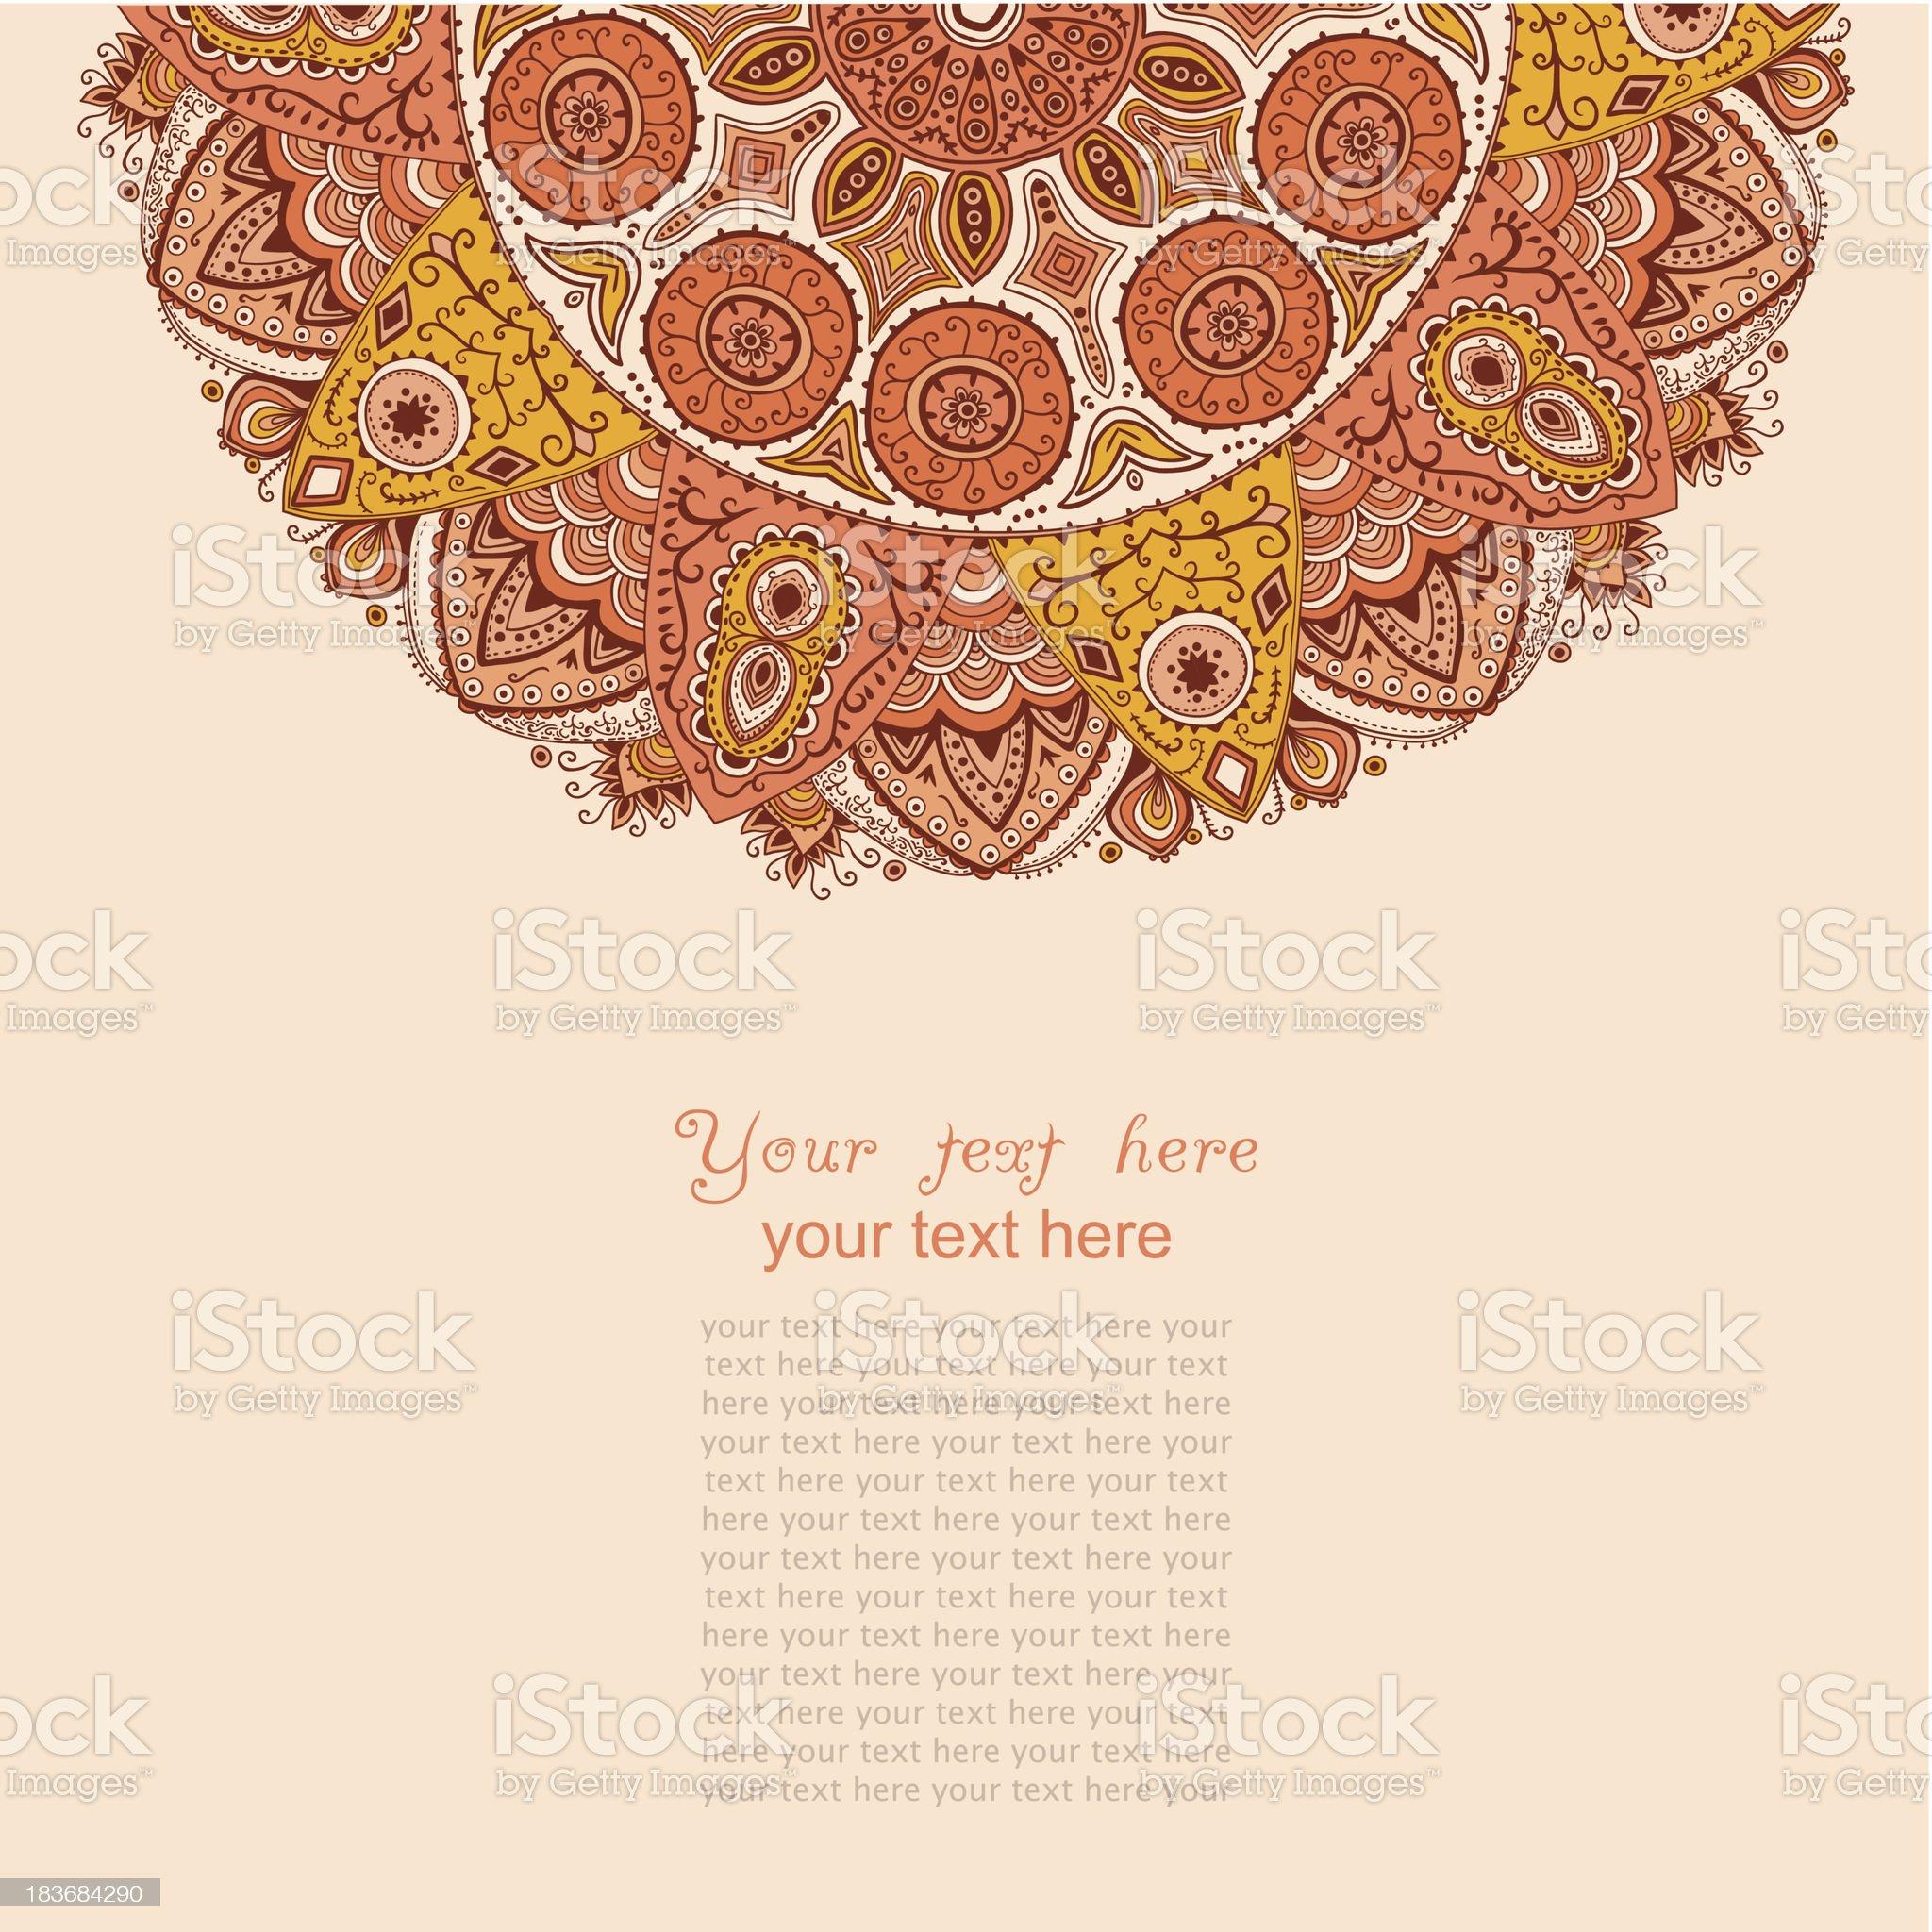 Decorative Vintage Design Element royalty-free stock vector art